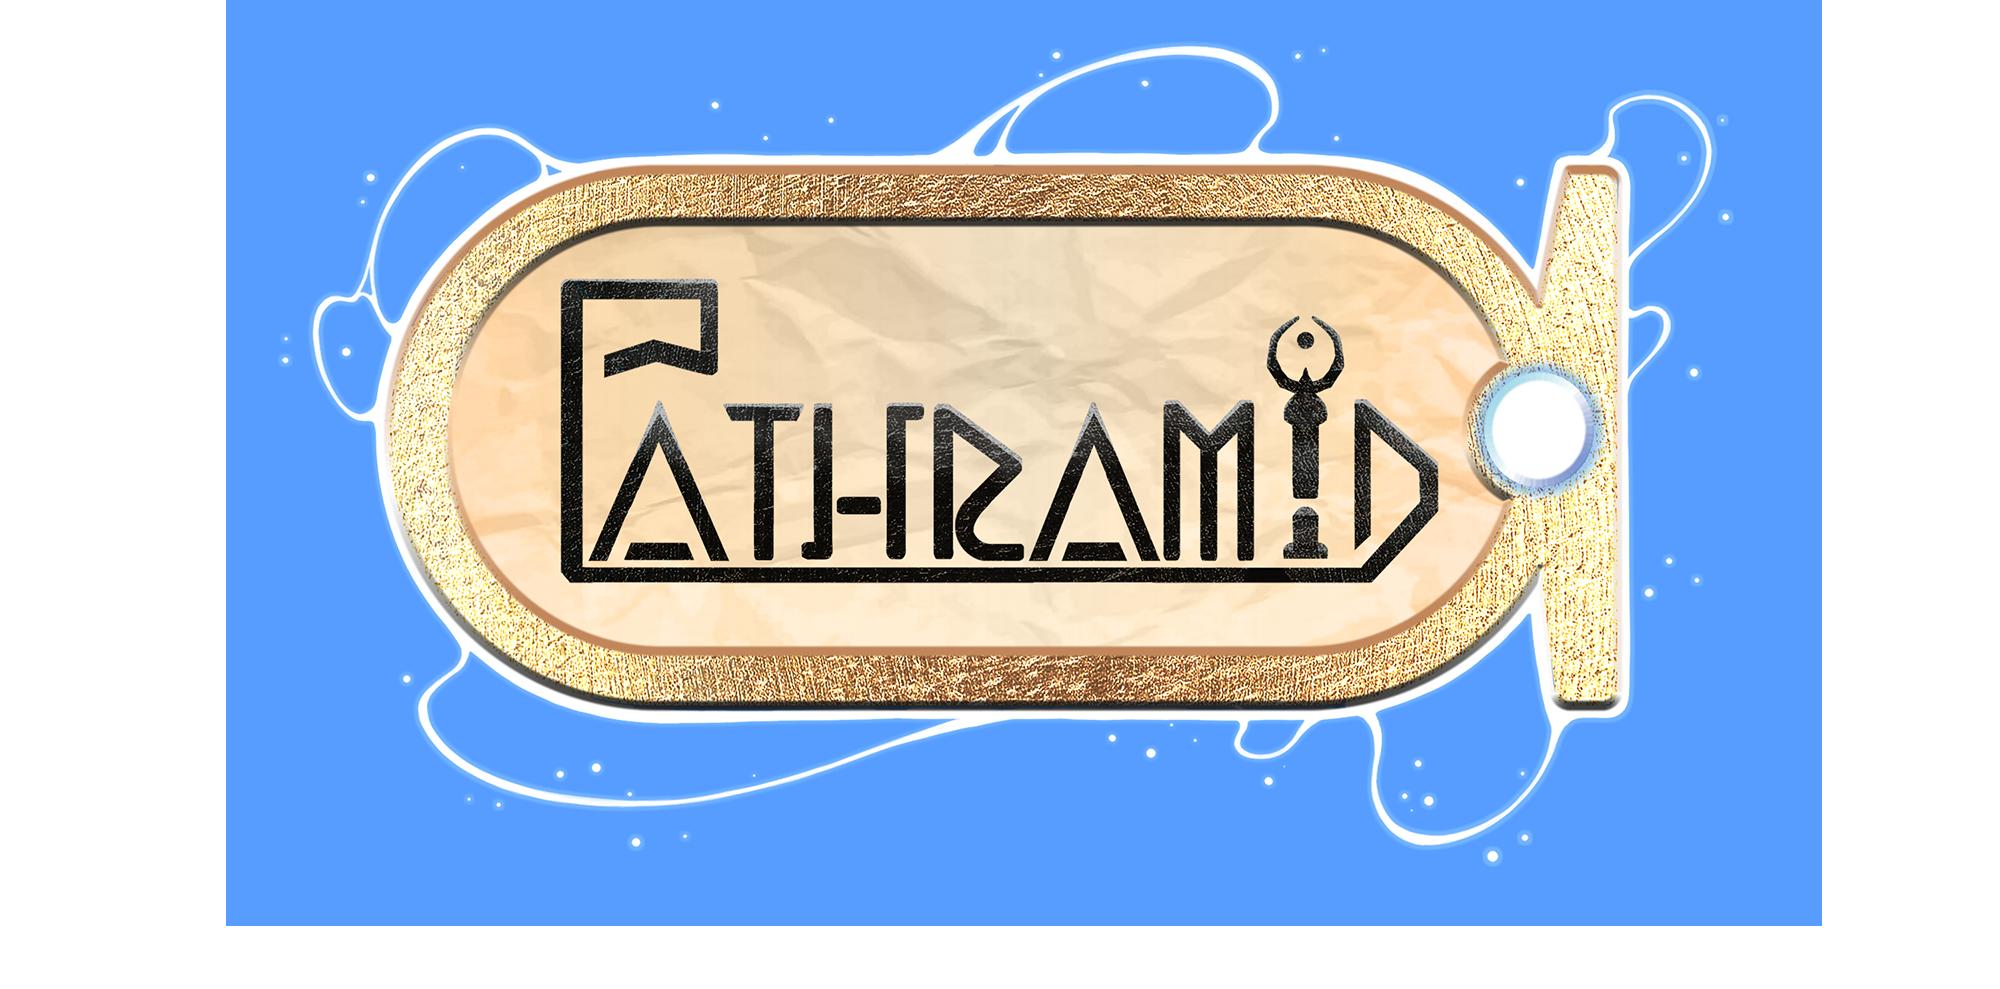 Pathramid